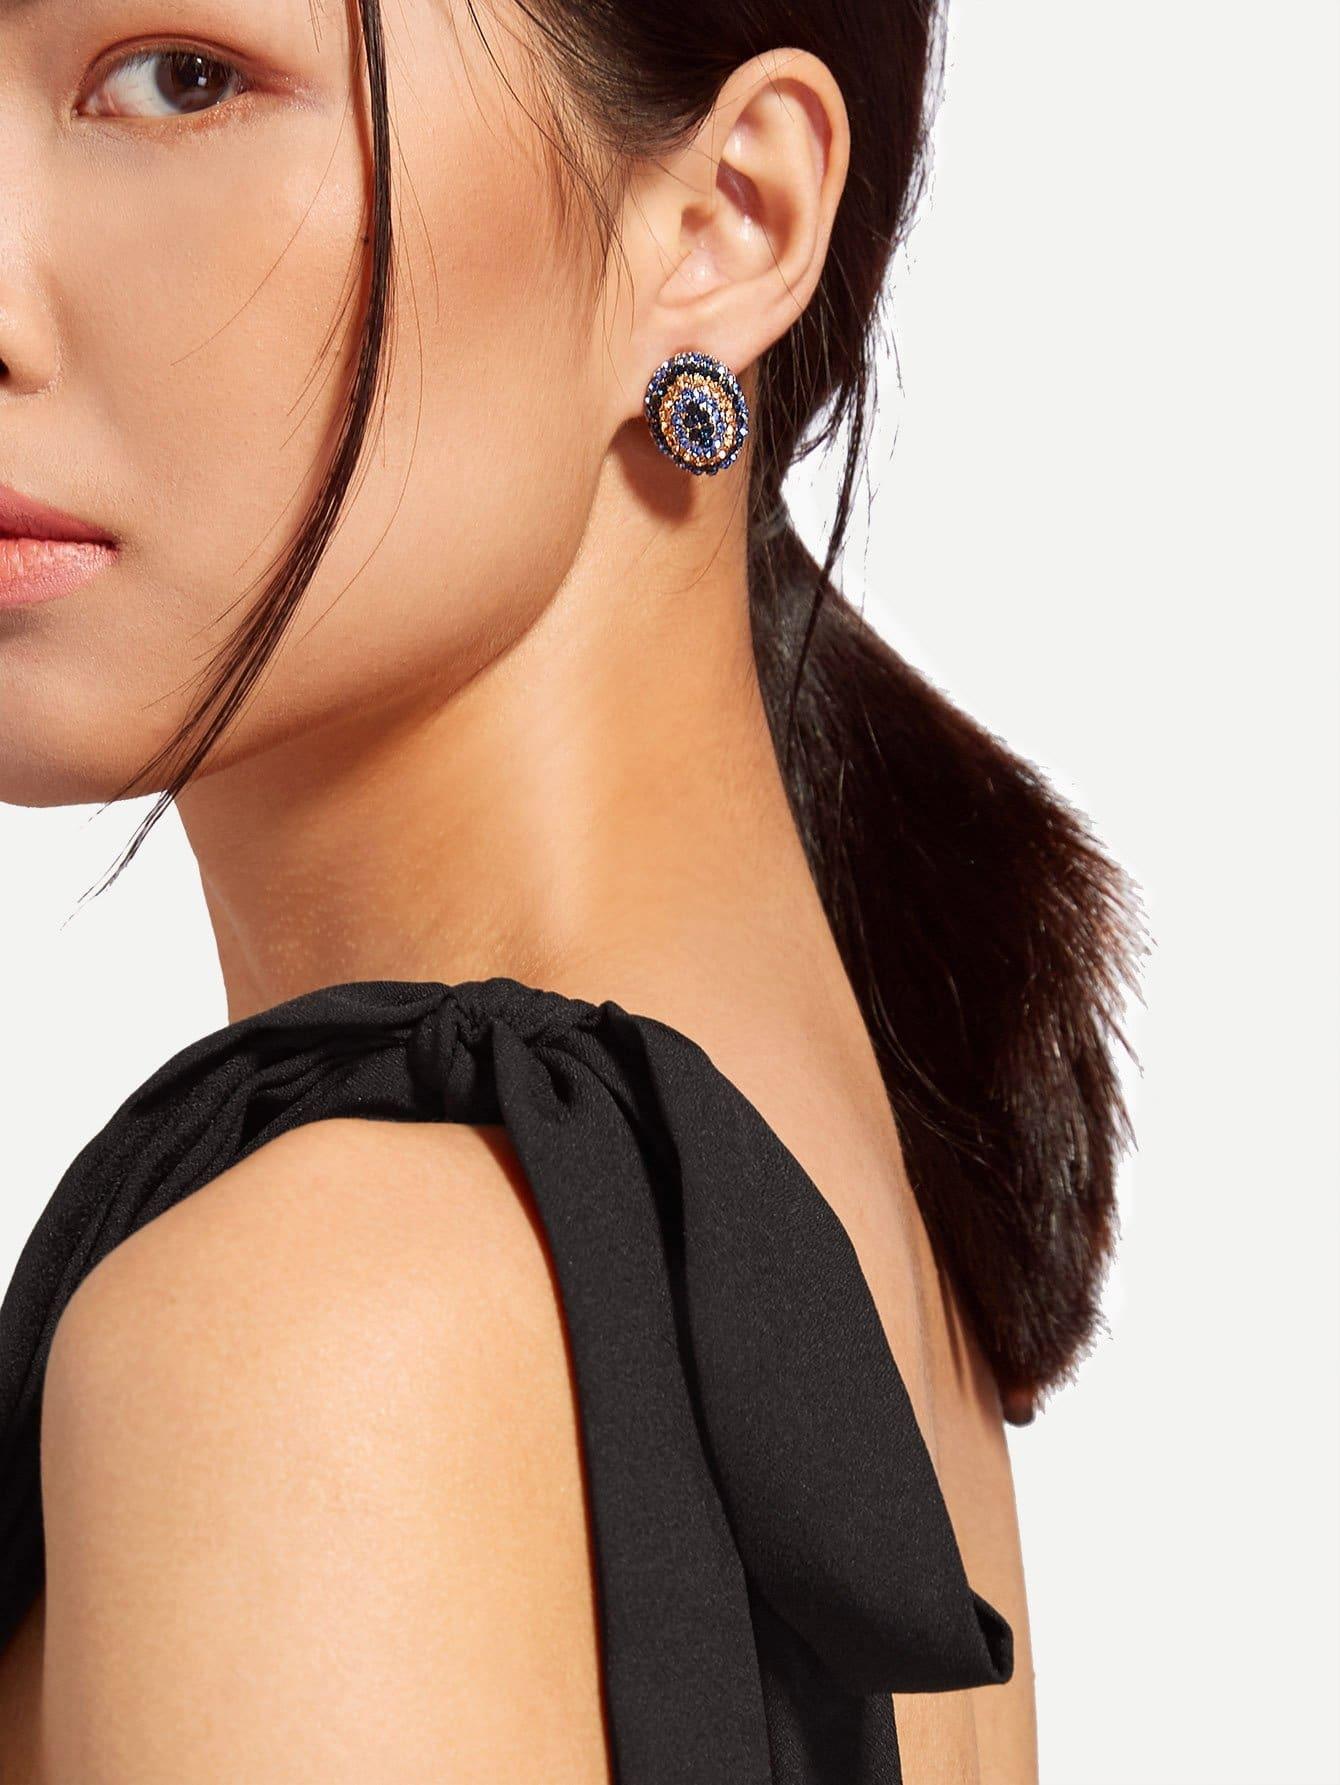 Two Tone Faux Rhinestone Stud Earrings two tone round flake drop earrings